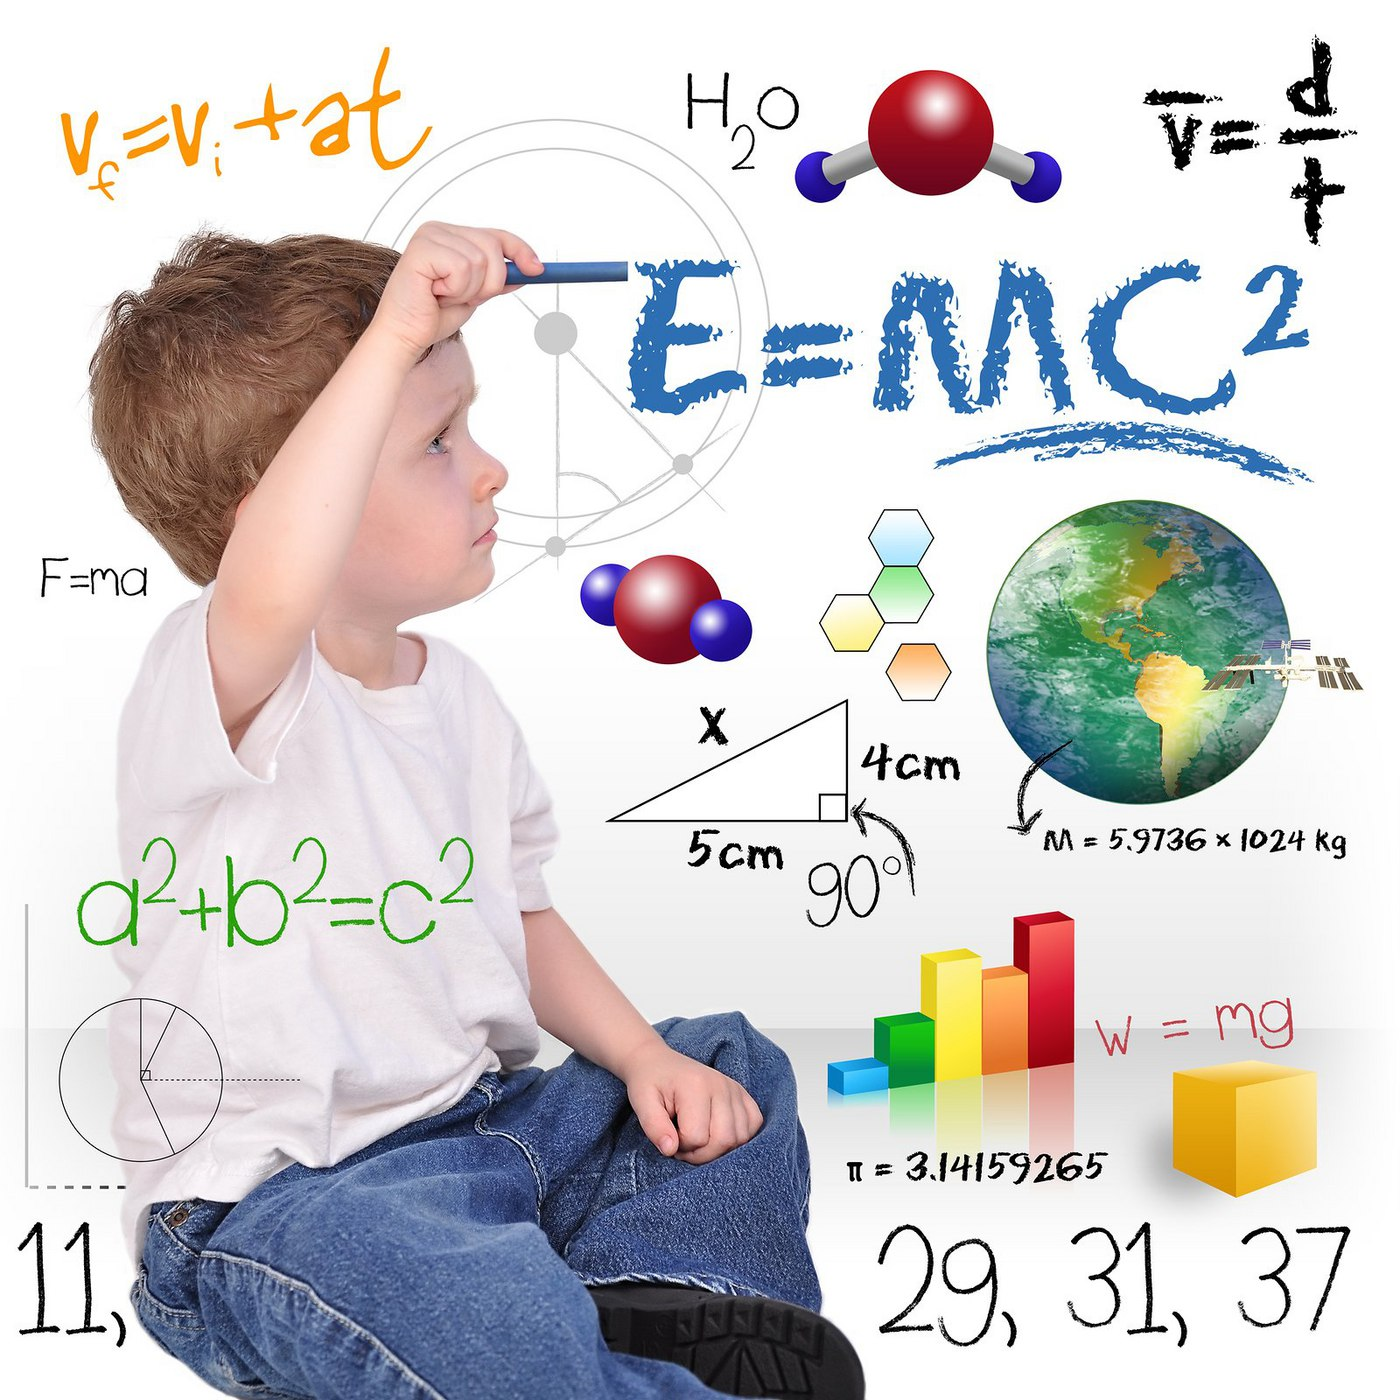 bigstock-Young-Math-Science-Boy-Genius--9198101